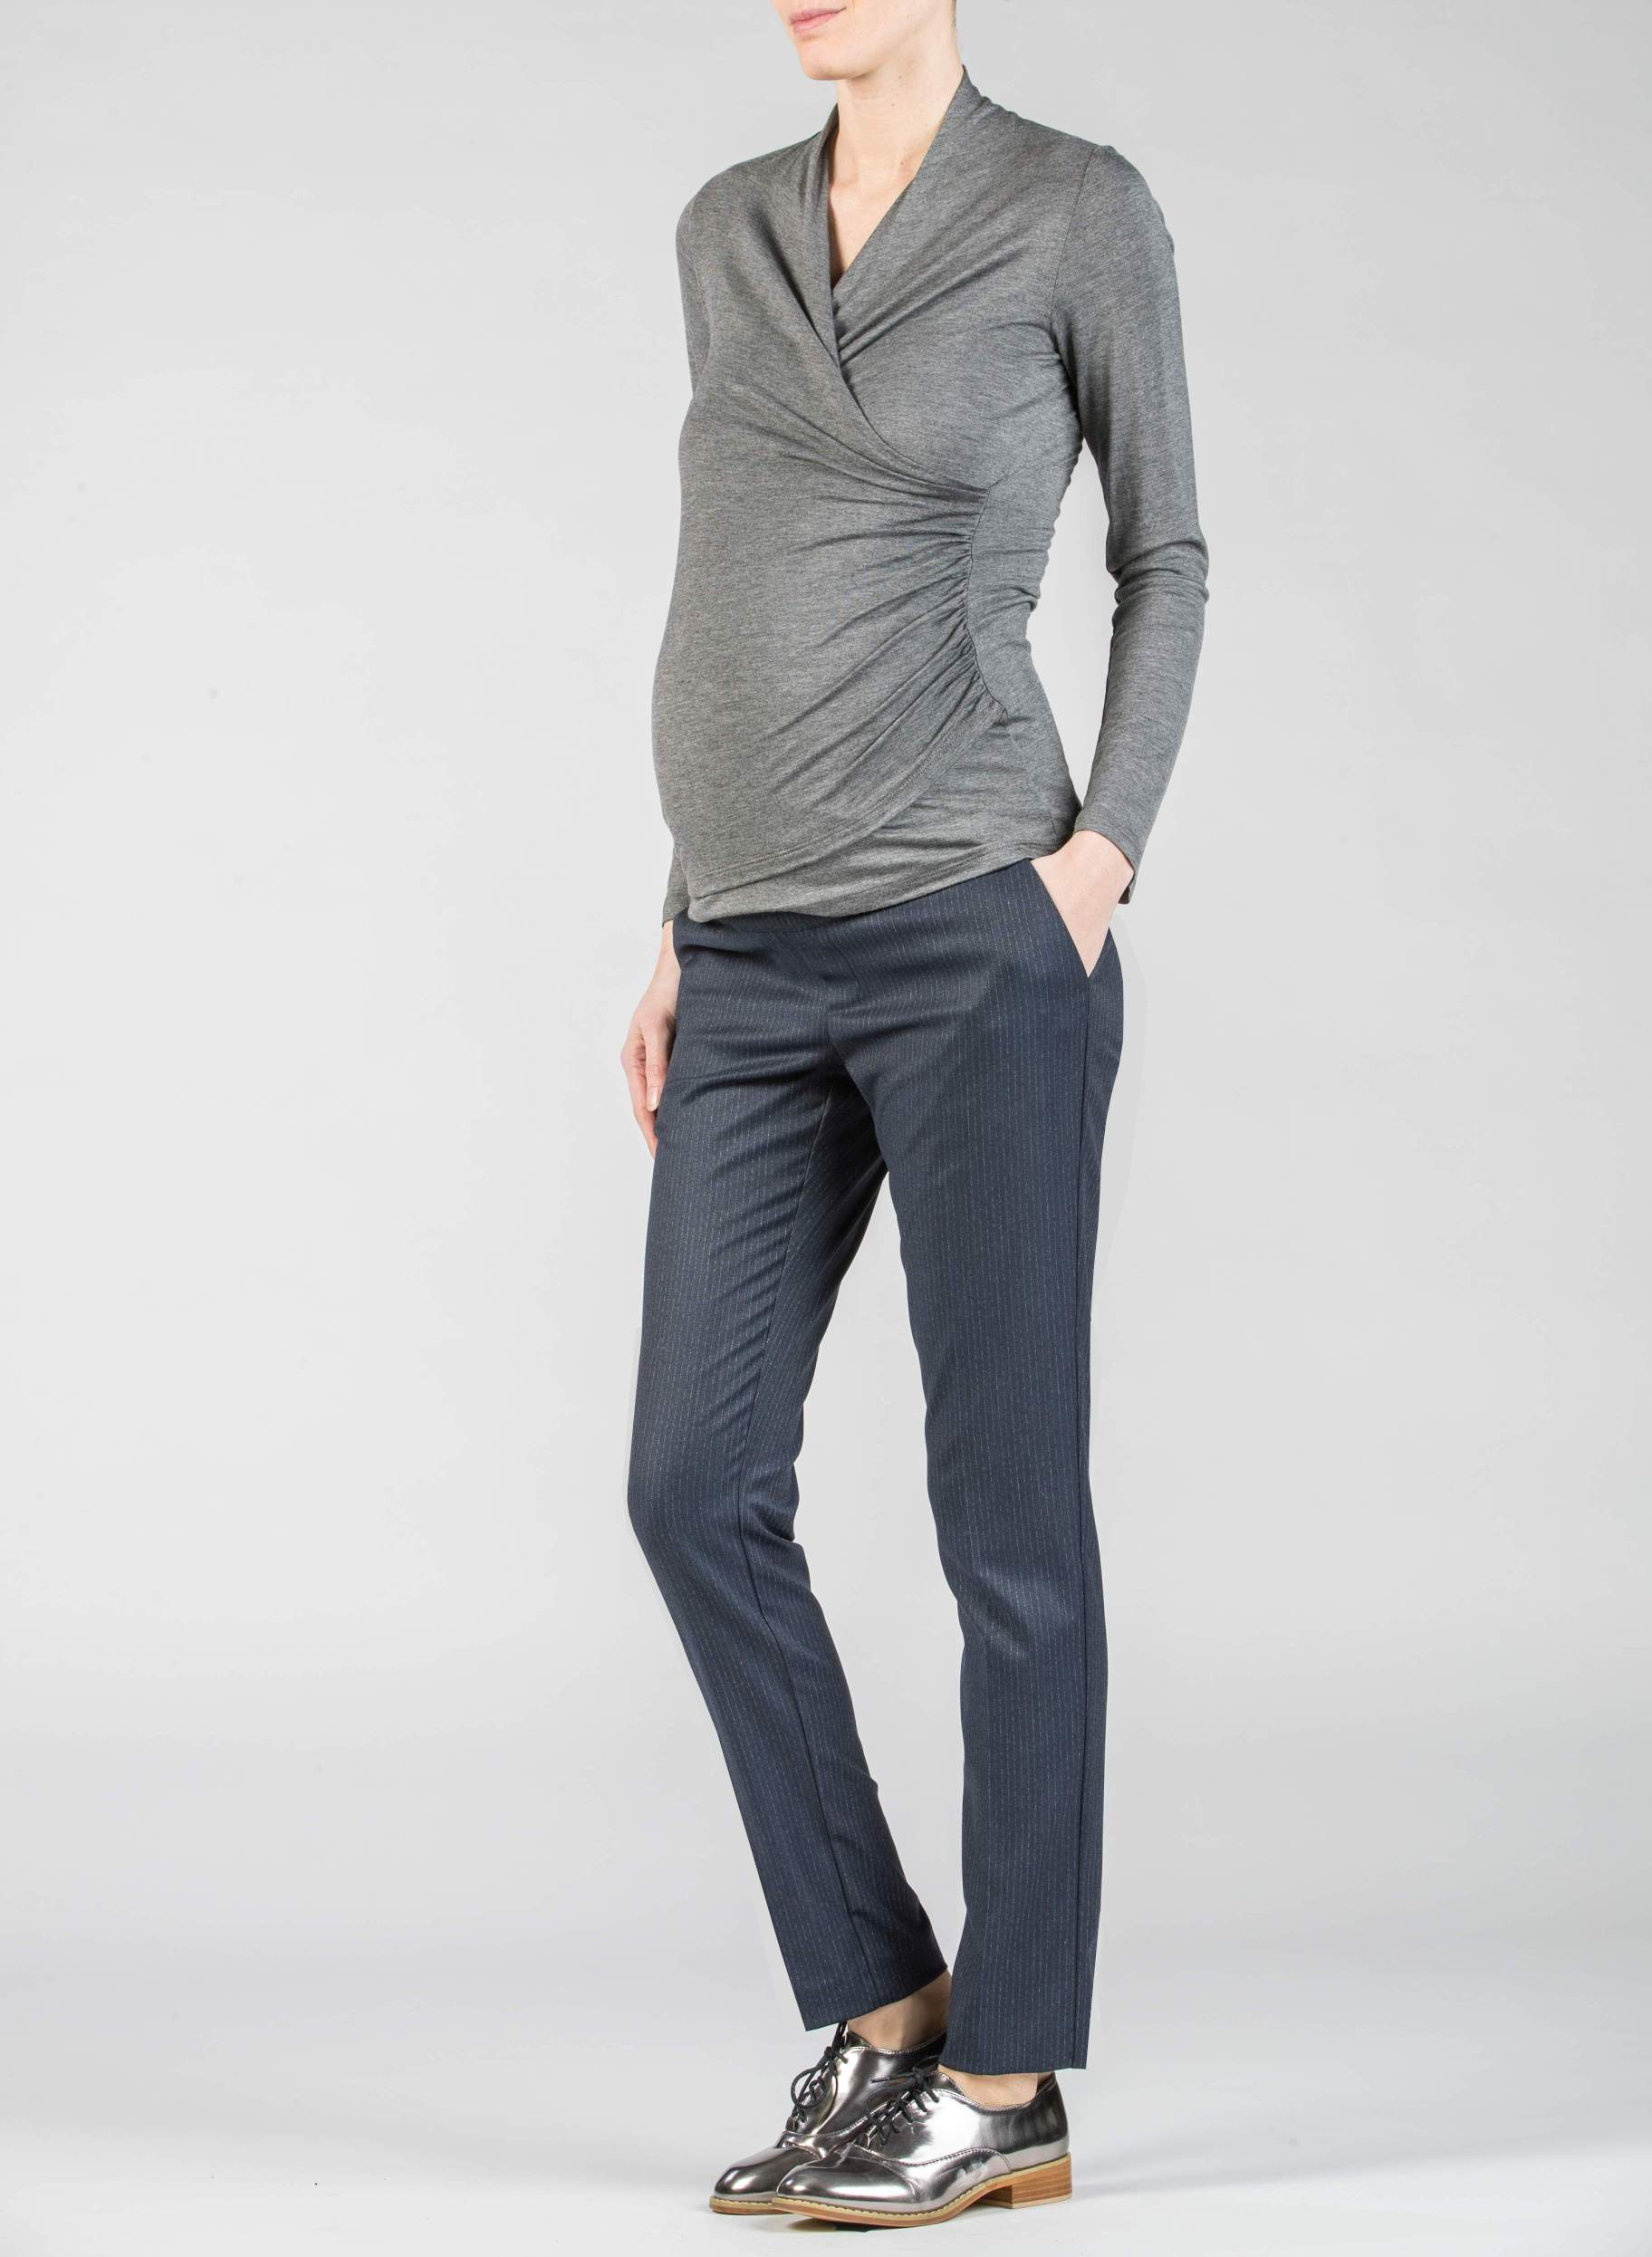 nuovo arrivo 2b012 12c61 Pantaloni - Pantalone Premaman Slim Fit Gessato | Attesa ...